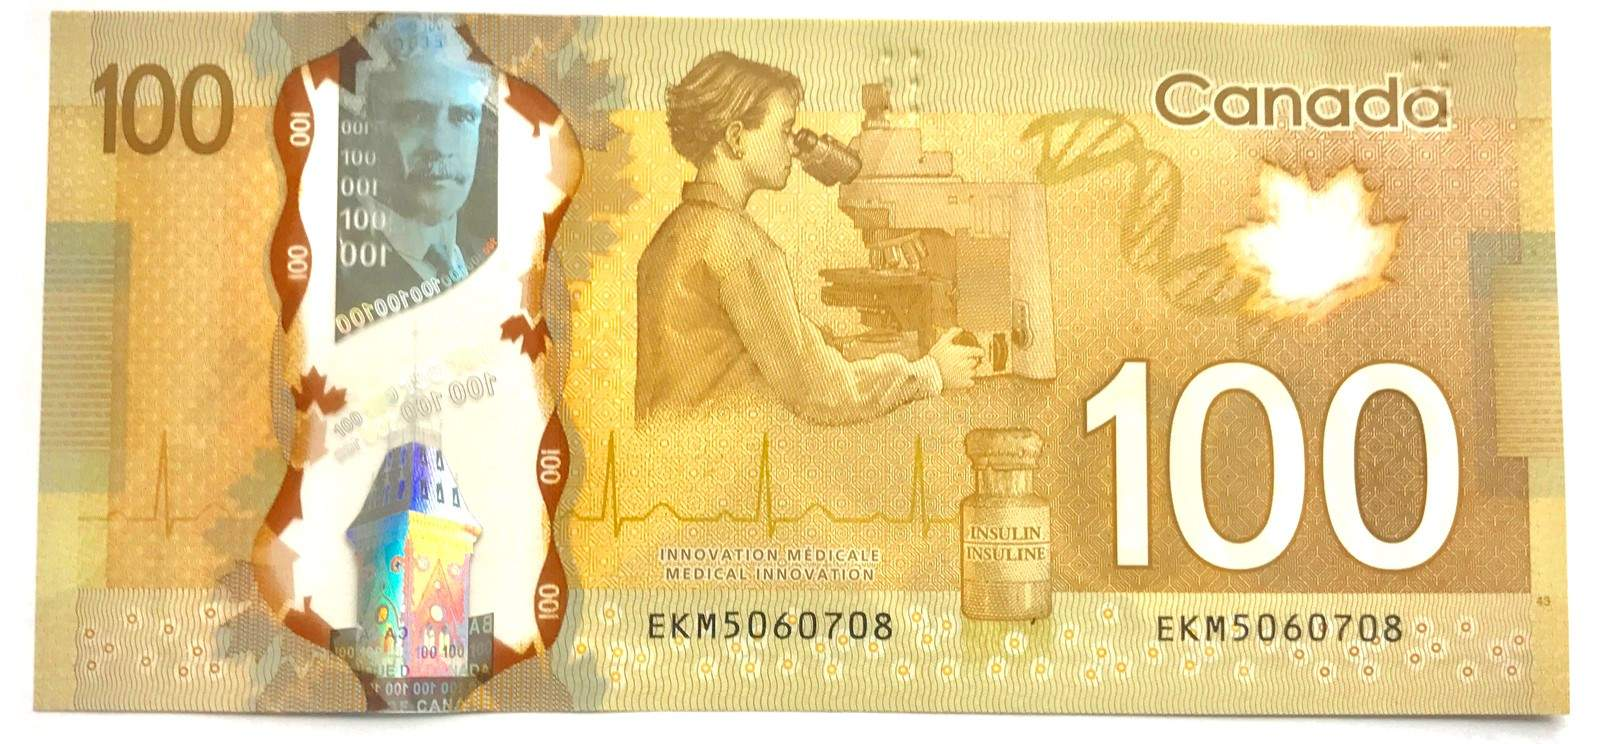 تصویر پشت اسکناس 100 دلاری ، متعلق به کاشف انسولین